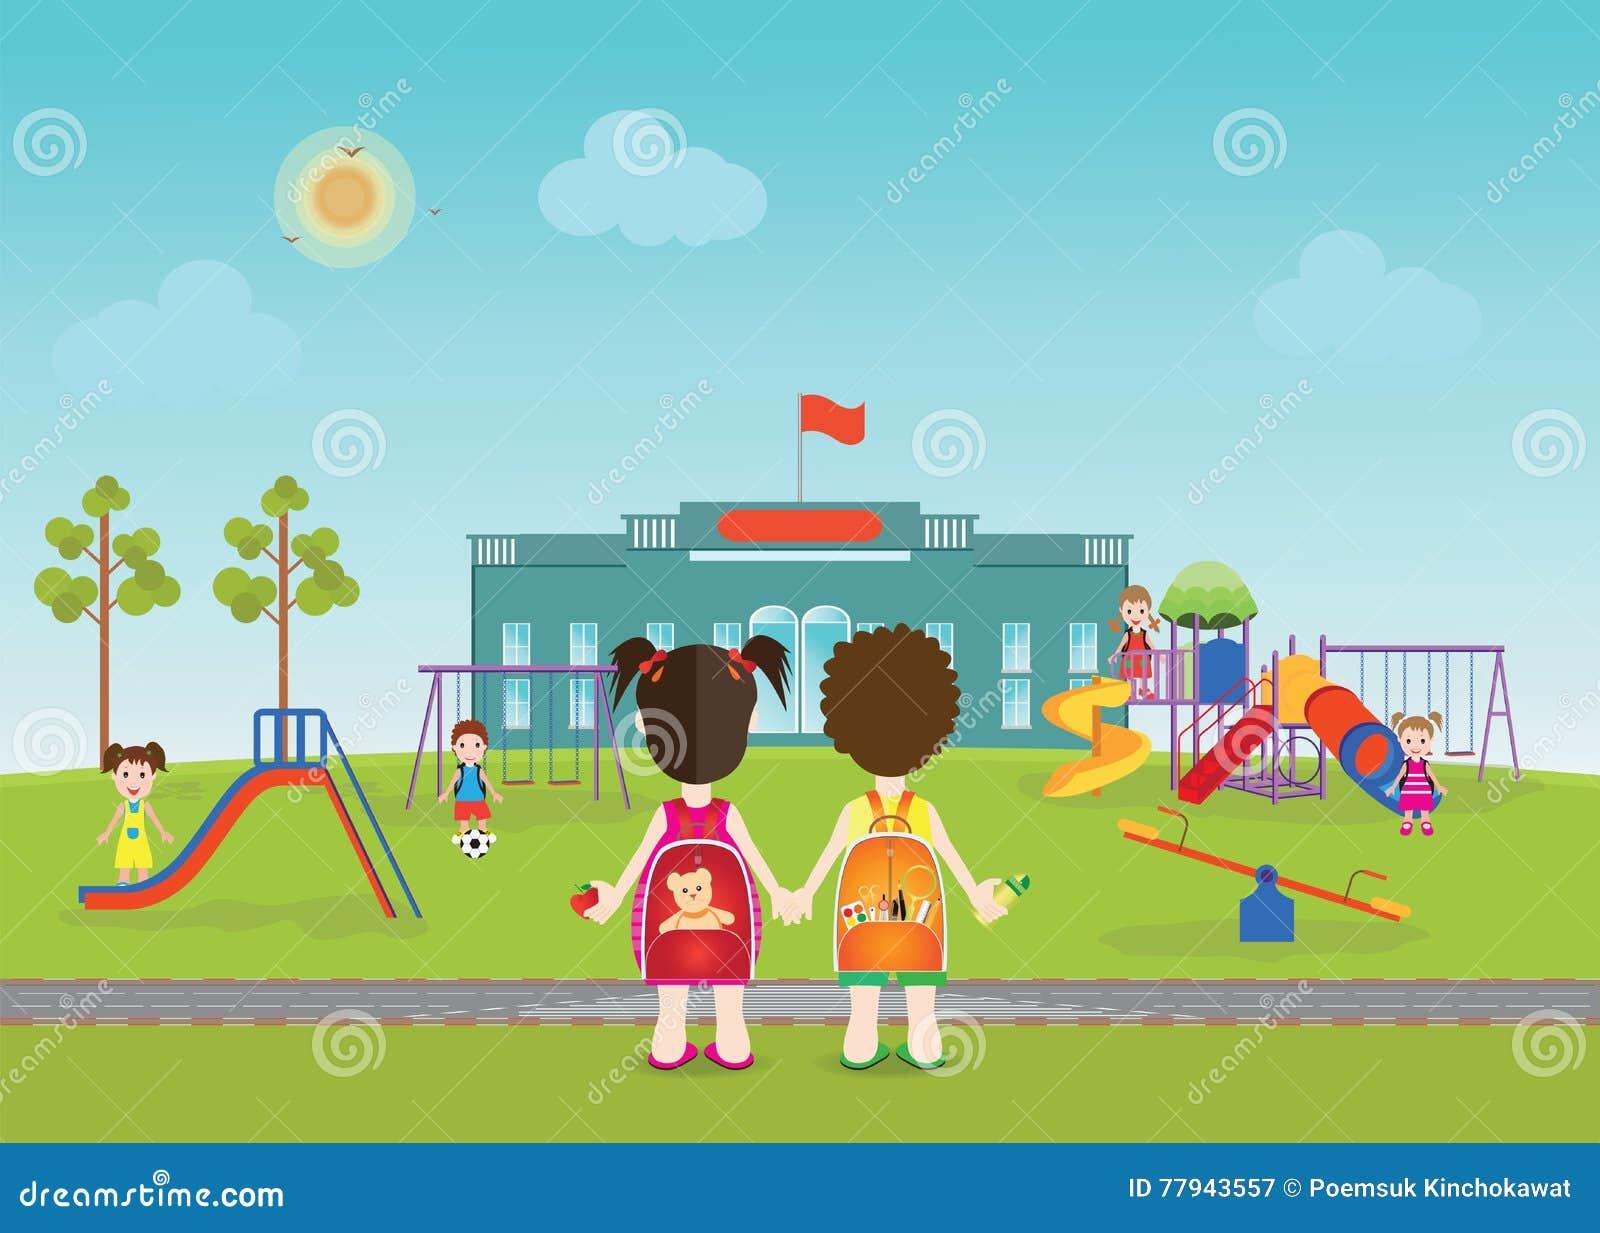 Kids Playing On Swings At School